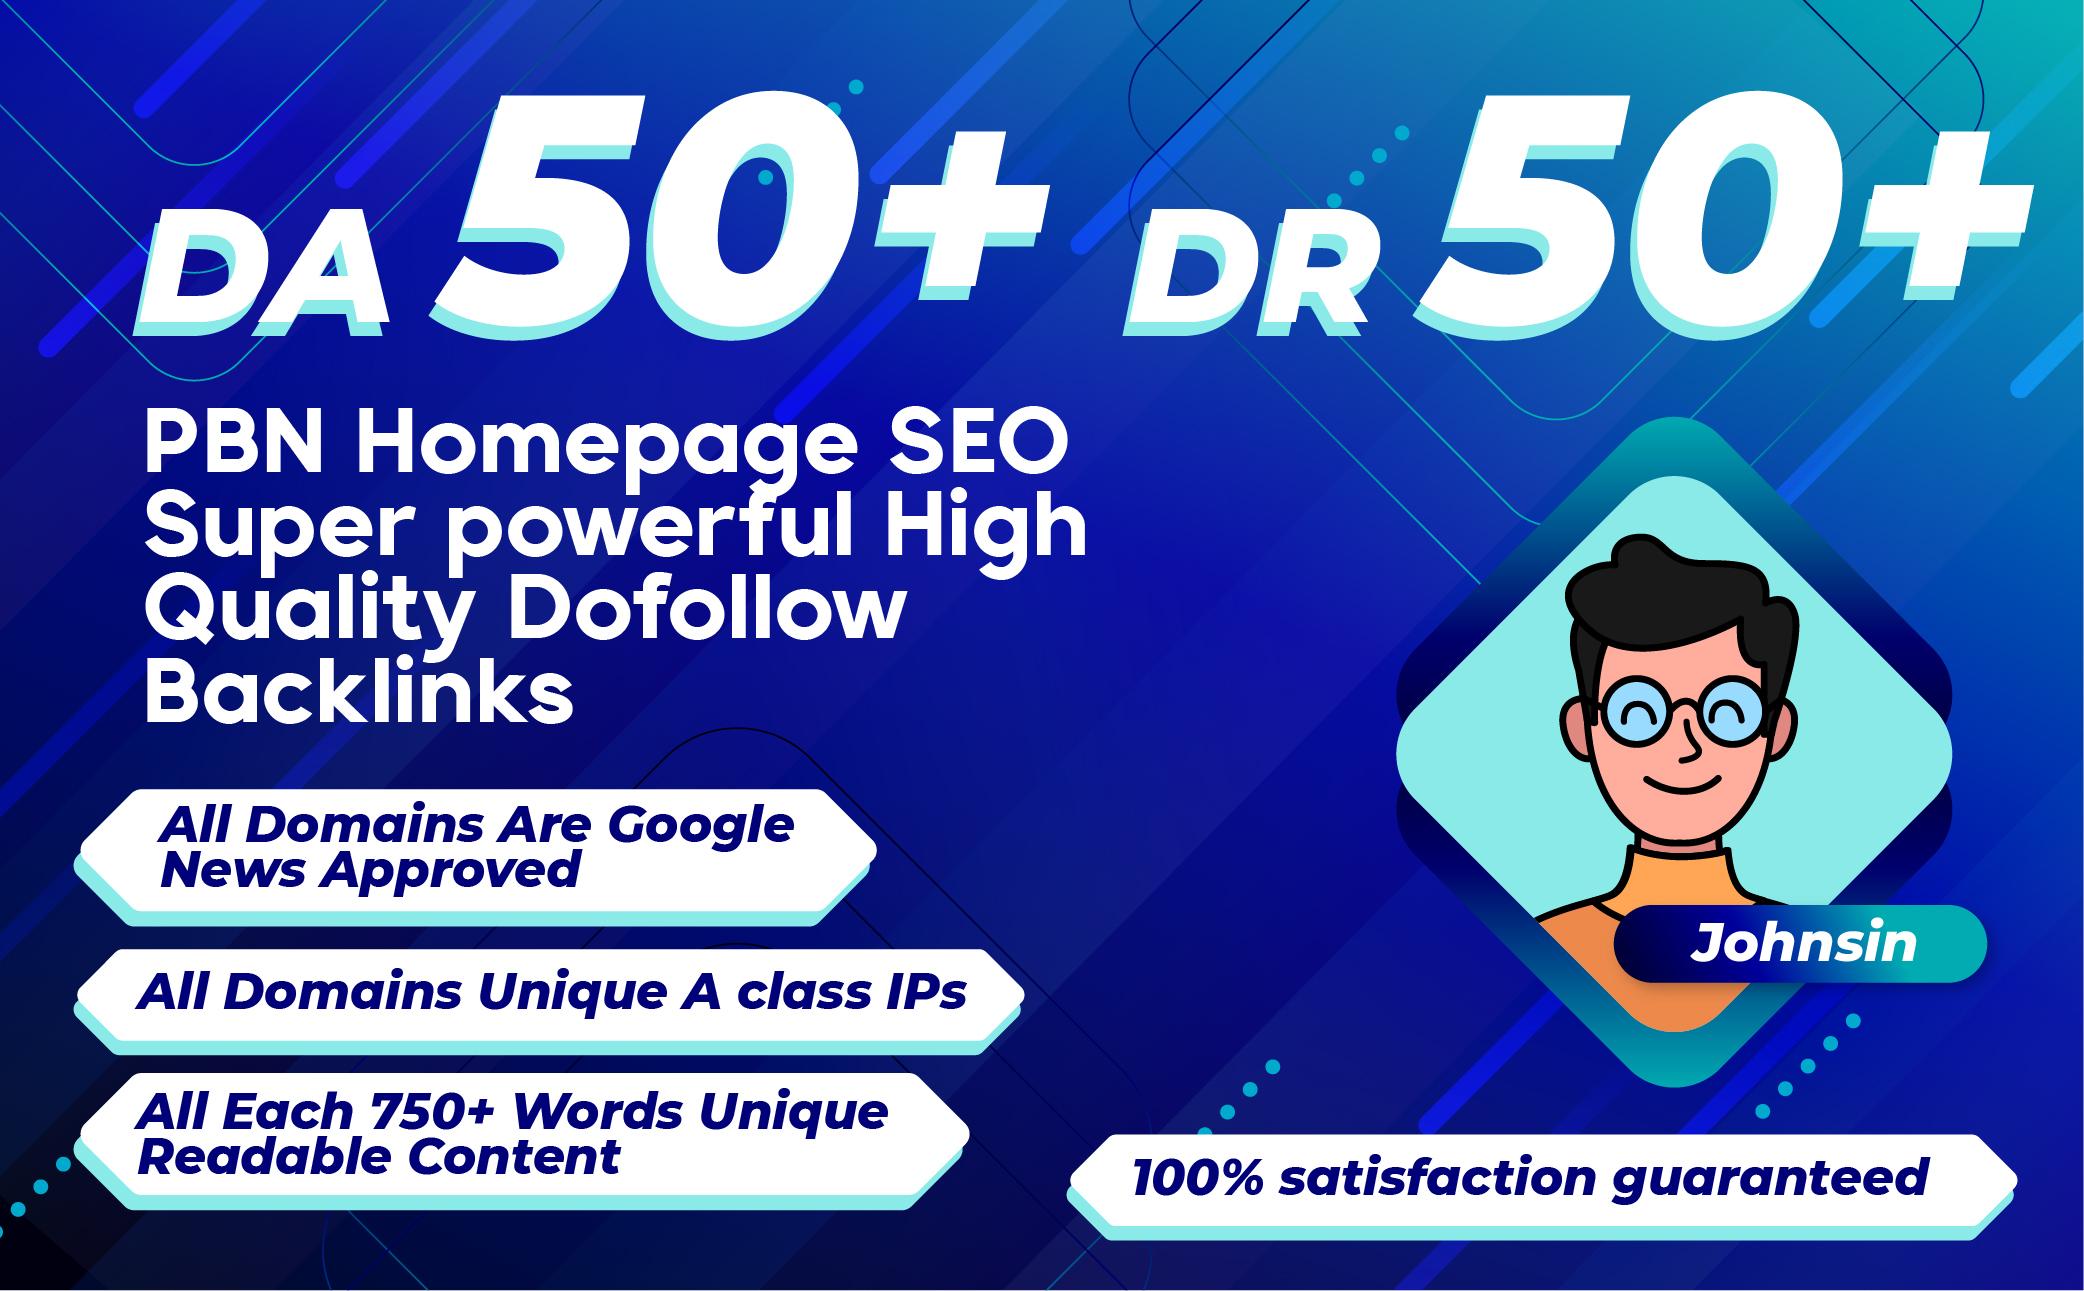 Homepage 100 PBN Backlinks High DA 50 To DR50 Plus Dofollow PBN Backinks